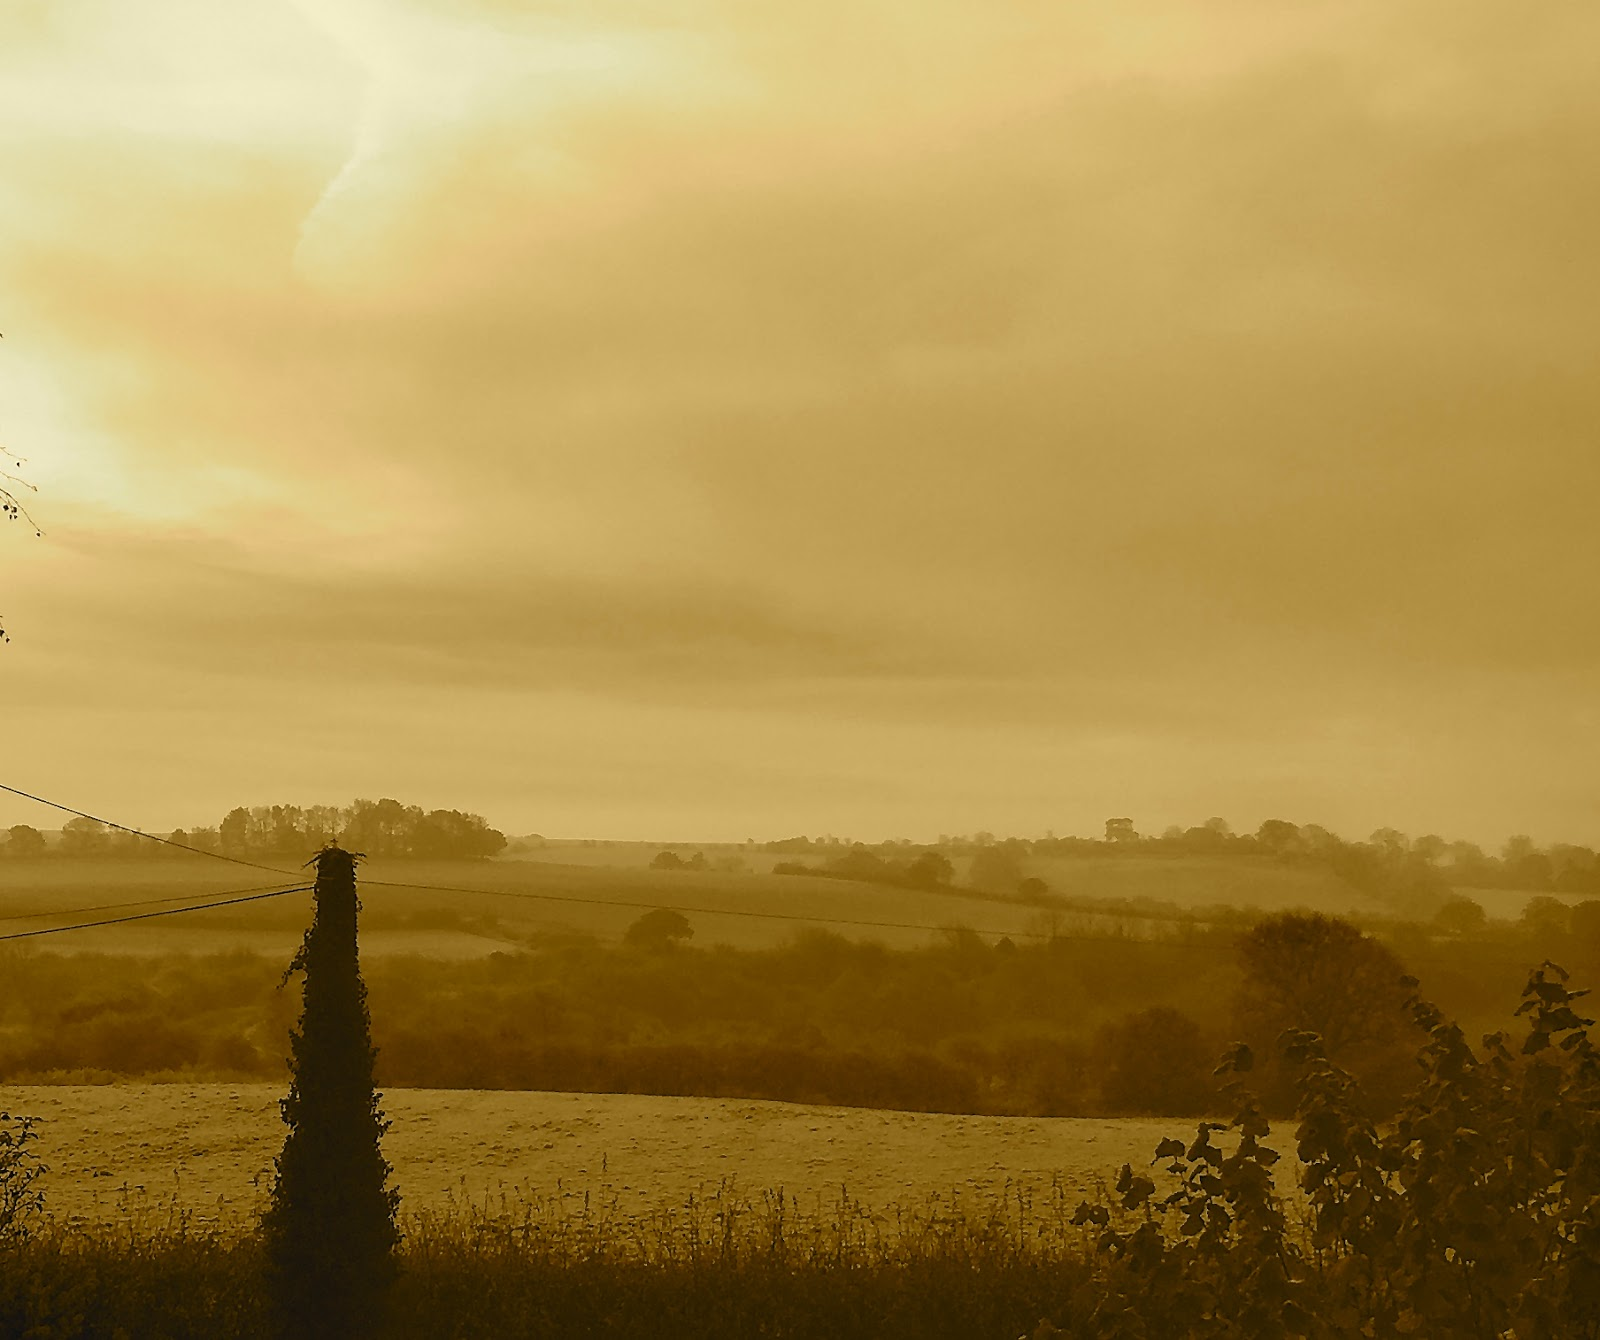 Morgan's Milieu   Thankful: A darkened view of a grassy field